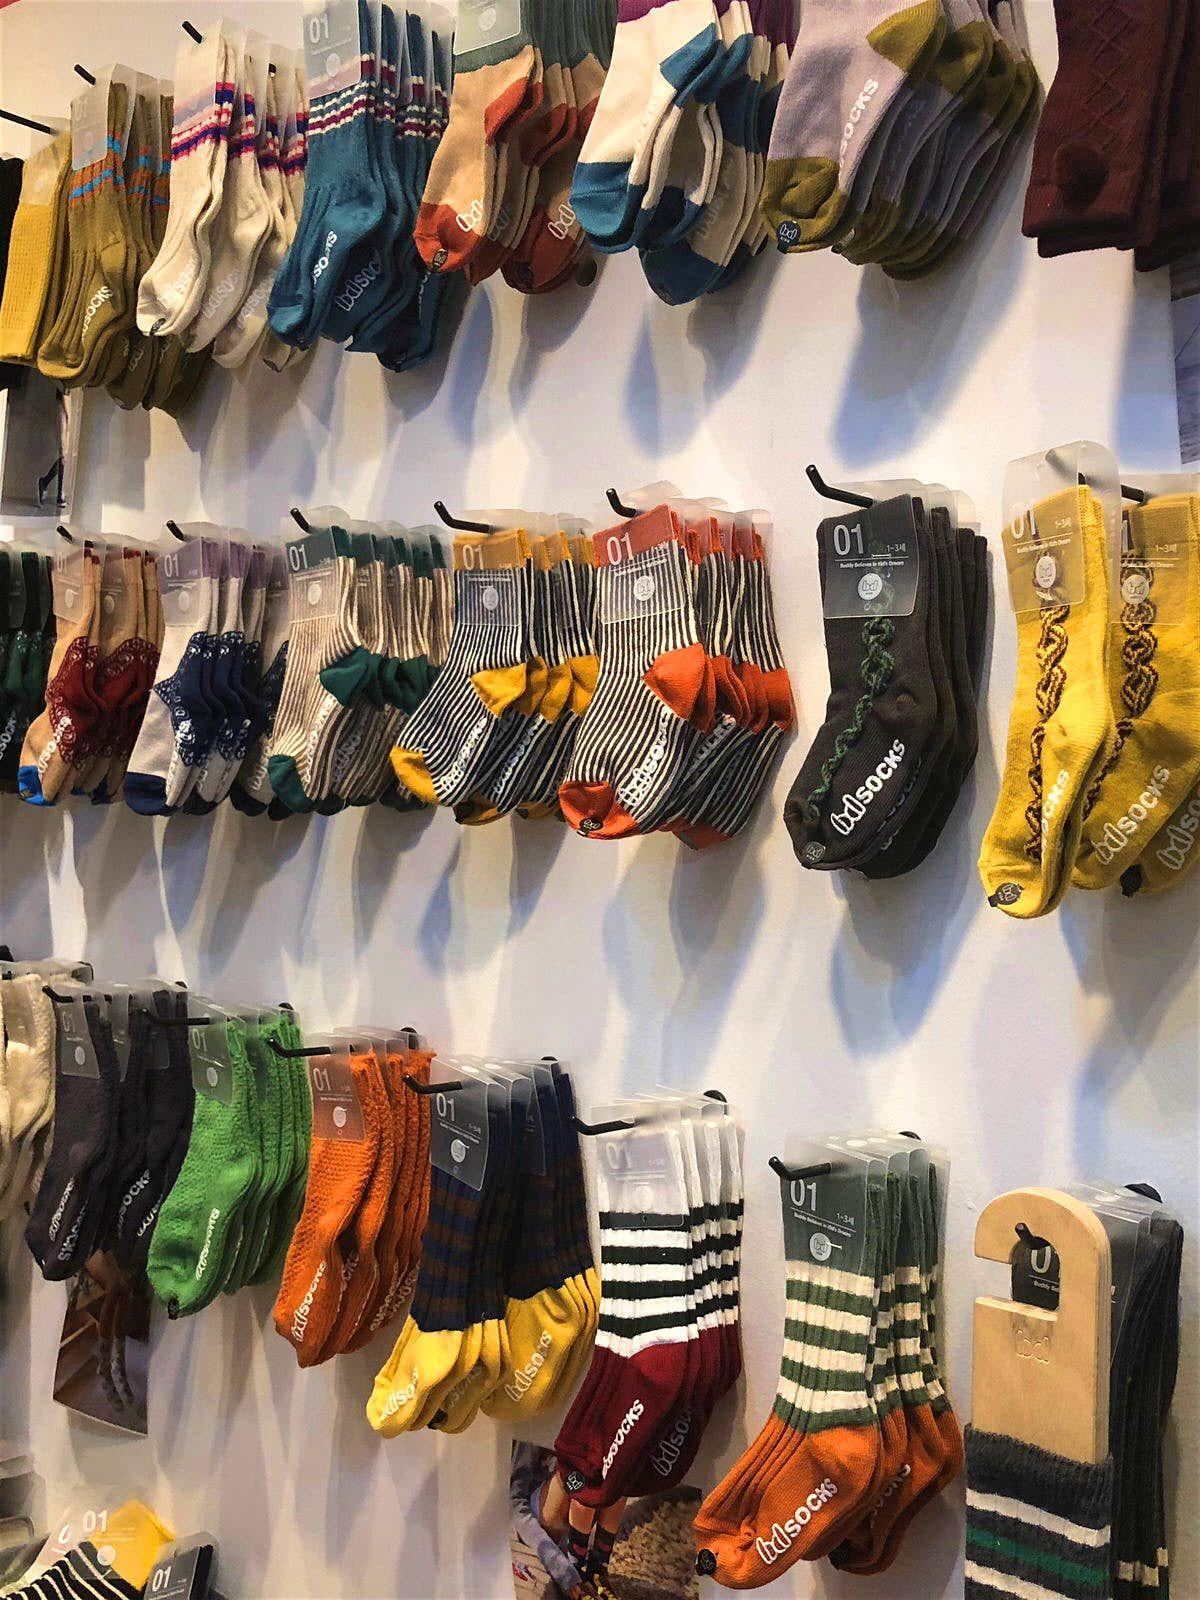 buy online 62f74 41f54 Barack Obama socks  Korean boy-band socks  Instant ramen socks  Matching  socks for couples  Socks for pets  If you can imagine it, you can find  socks in ...